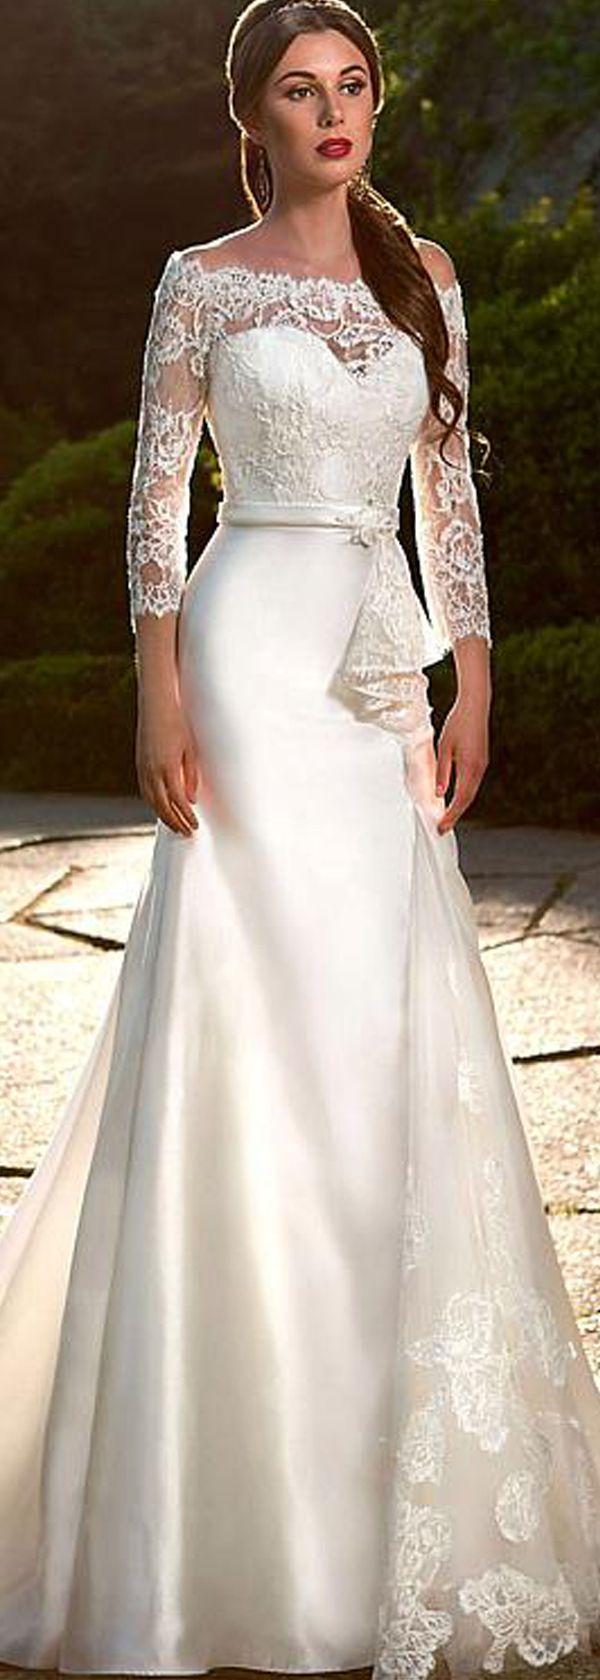 Mermaid Wedding Dresses : Elegant Satin & Tulle & Lace Off-the-Shoulder Neckline Mermaid Wedding Dresses w